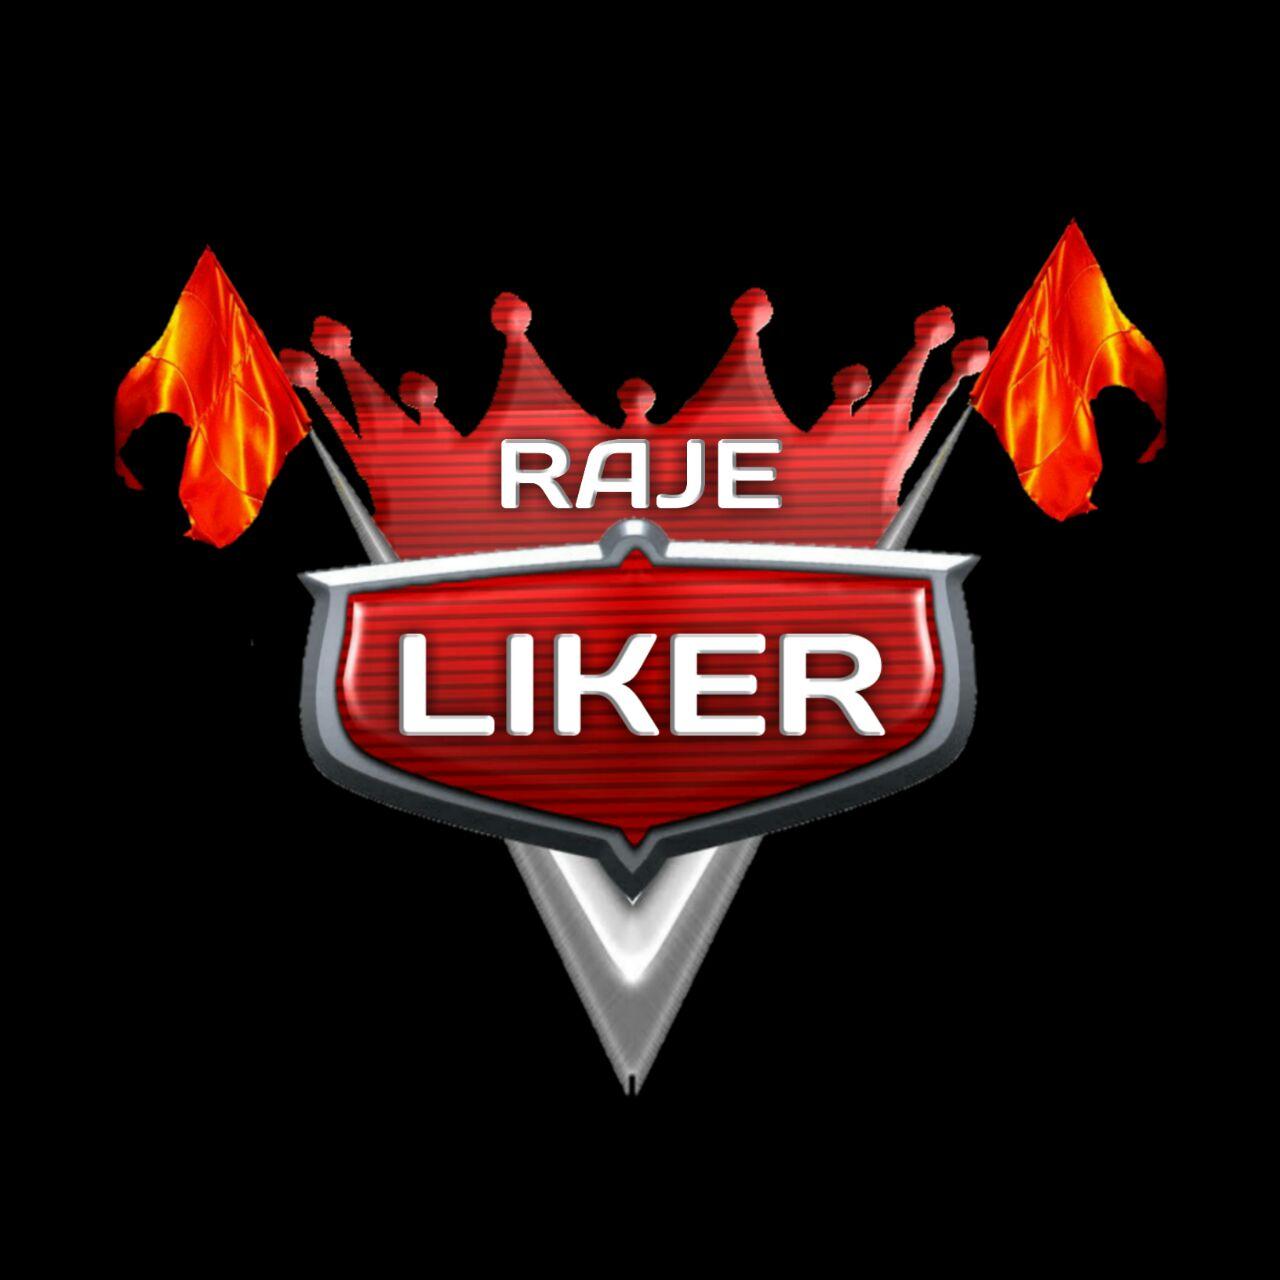 Raje Liker - #1 SMM PANEL Cheapest indian SMM Reseller panel  - Services